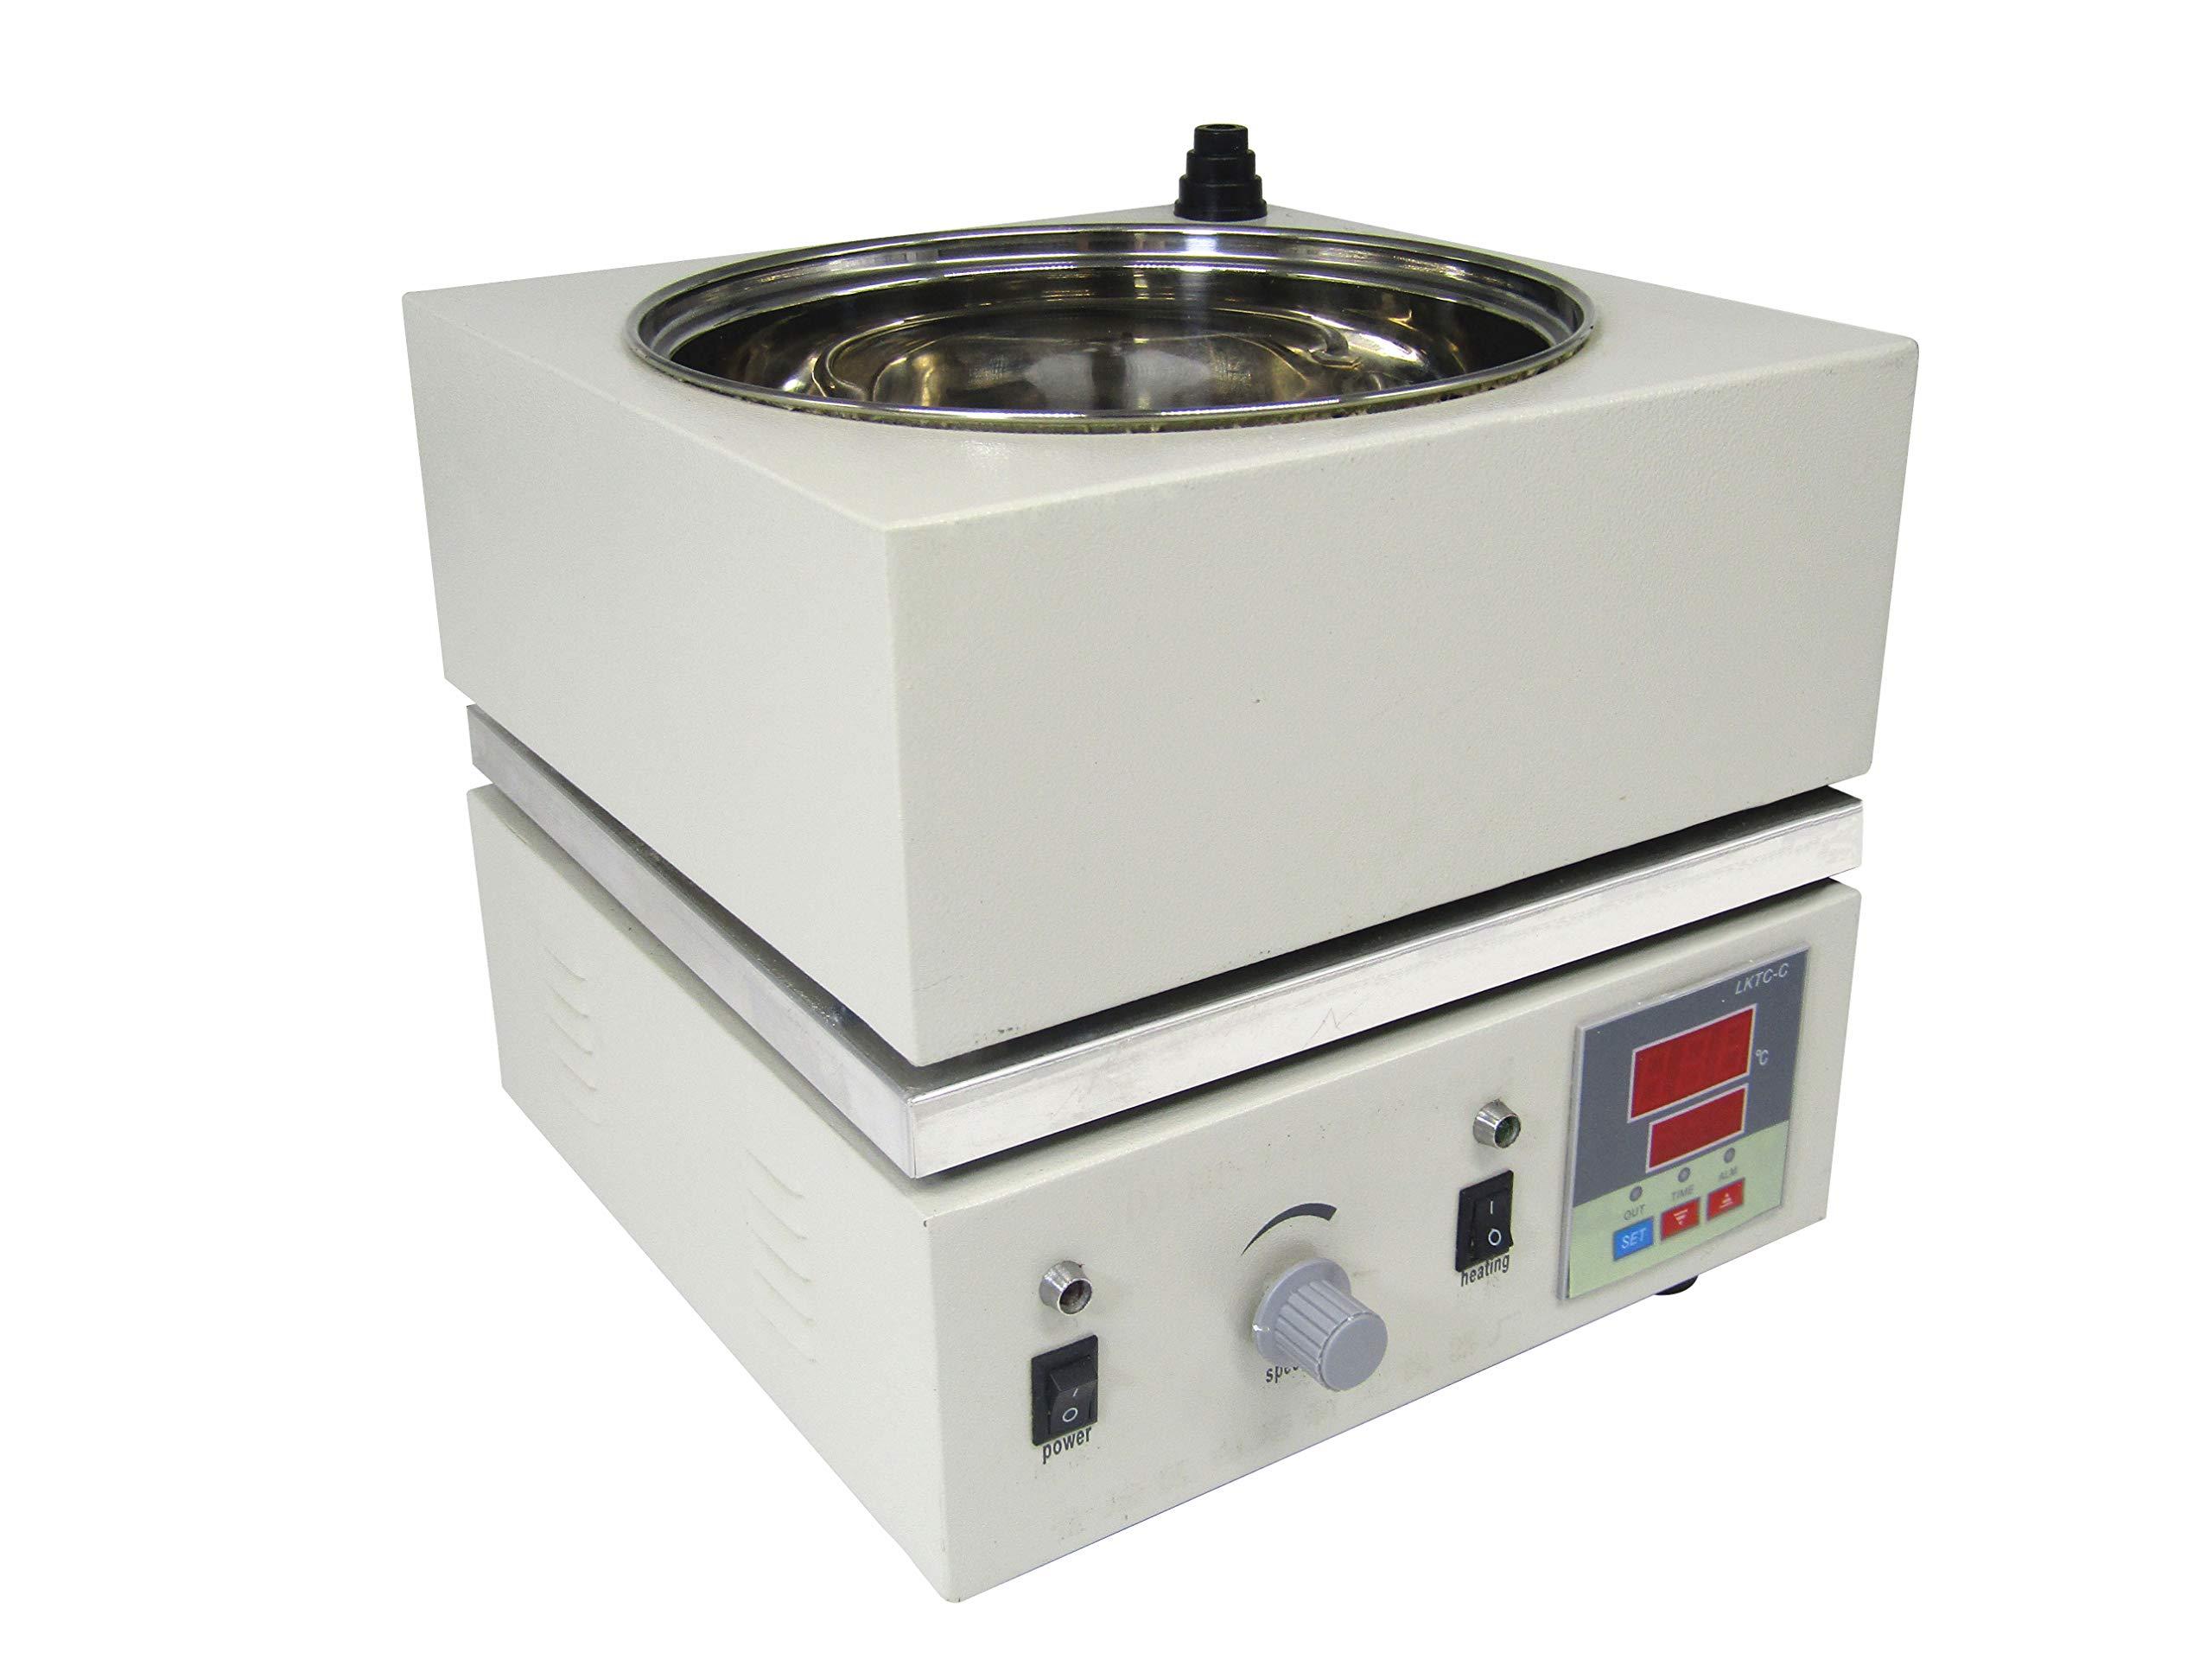 YUCHENGTECH Digital Magnetic Stirrer Mixer Water Oil Bath Heat-gathering Thermostat 300°C 2000ML (110V) by YUCHENGTECH (Image #4)